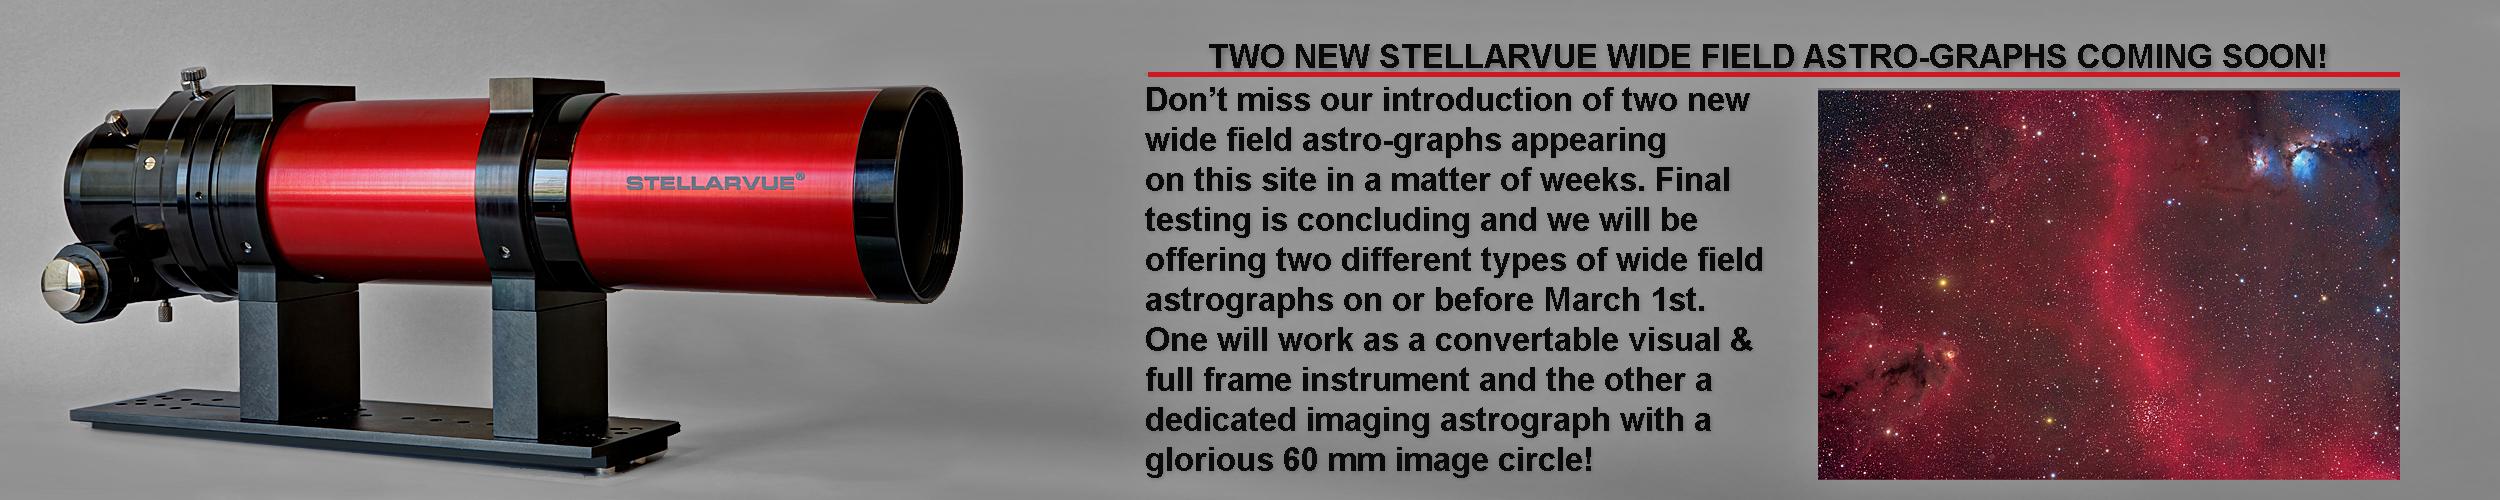 astrographs-announcement-1.jpg